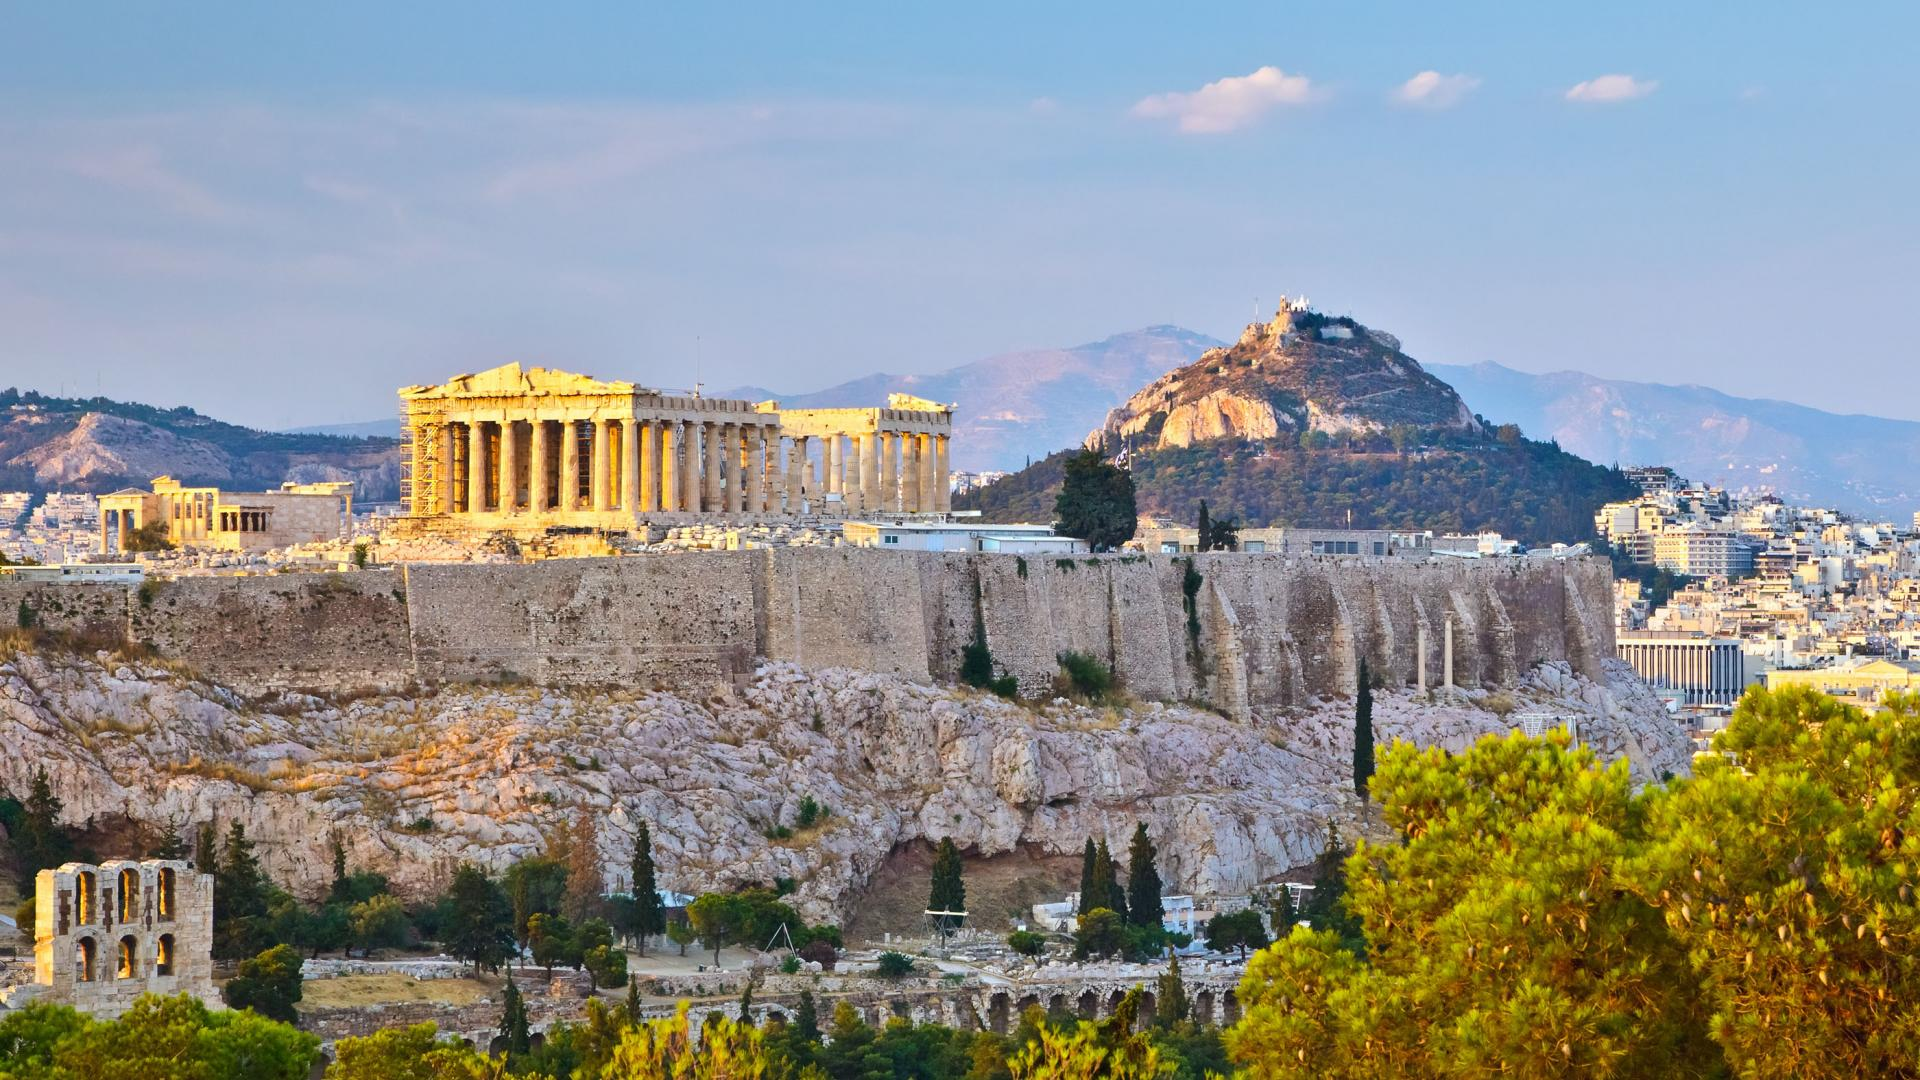 Athens Wallpapers AK23B1R 32856 Kb   4USkY 1920x1080